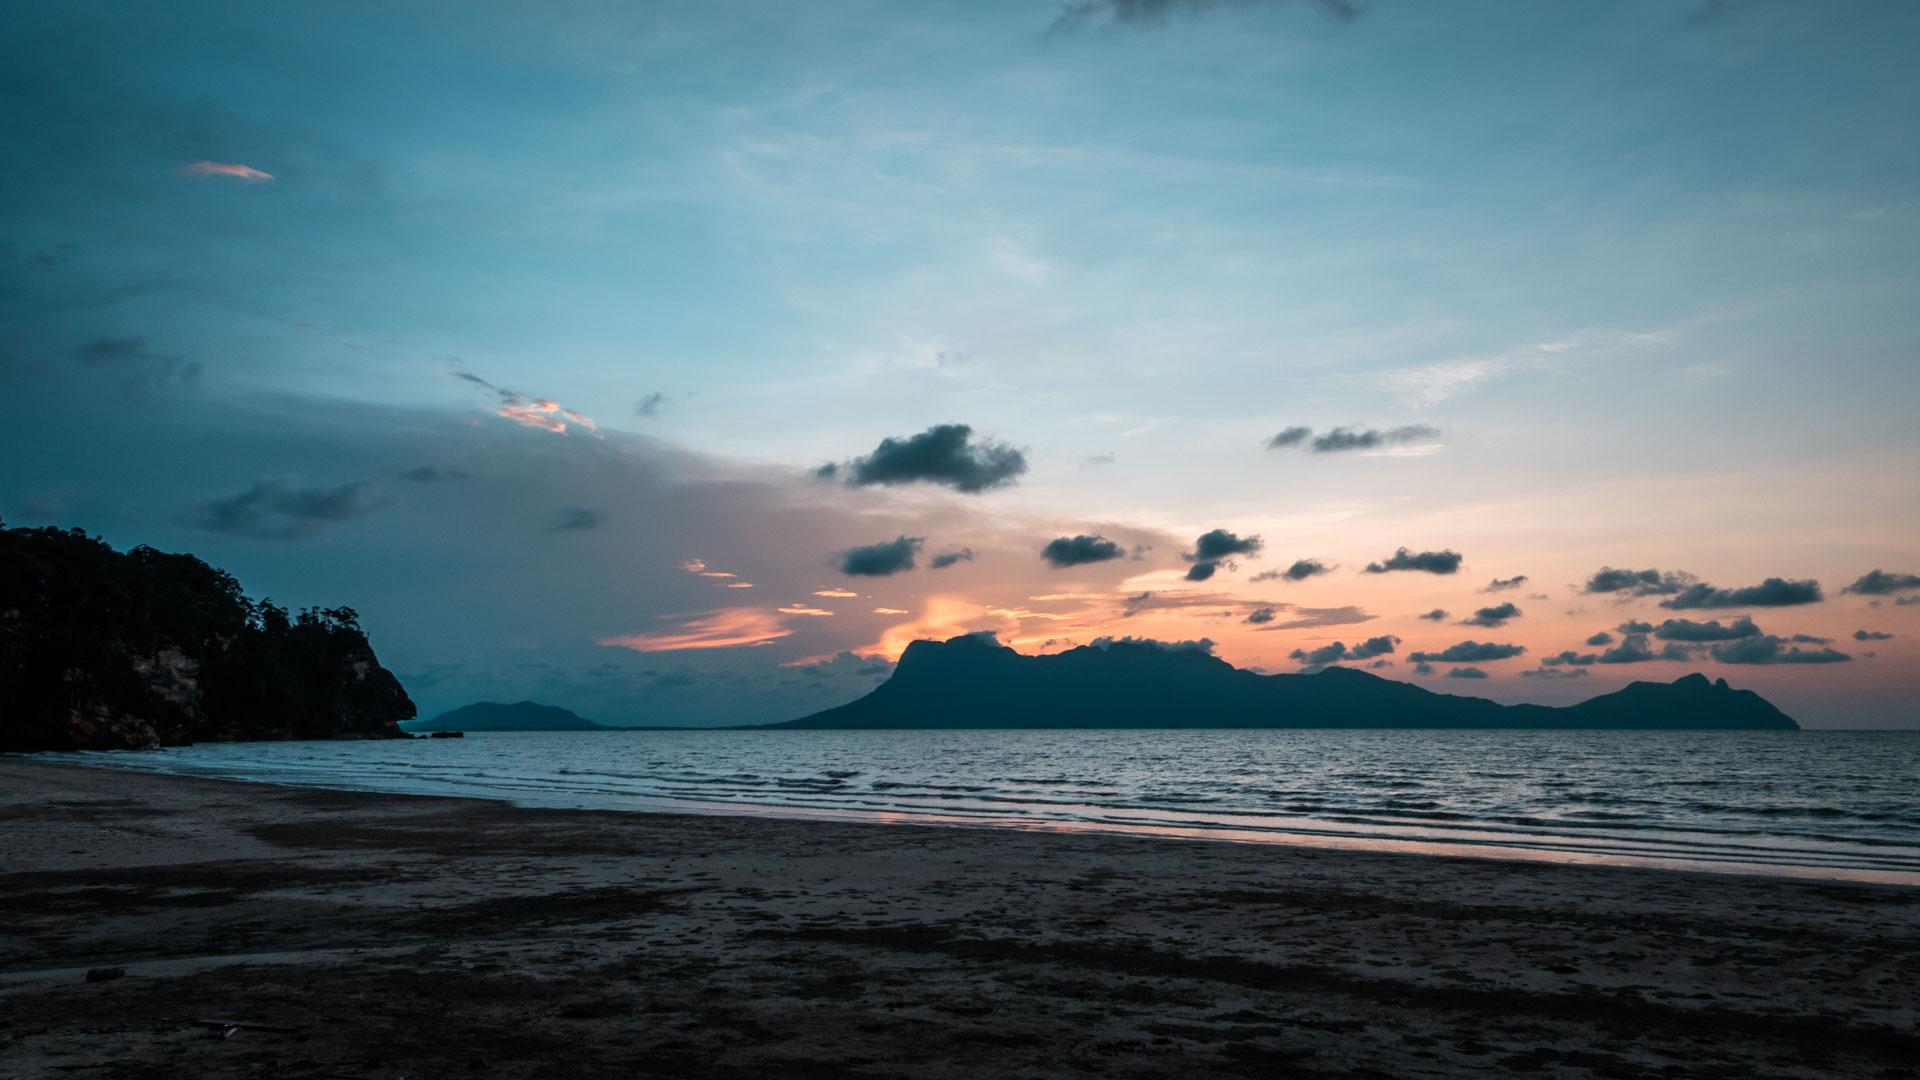 Zachód słońca na plaży, Bako National Park, Borneo, Malezja